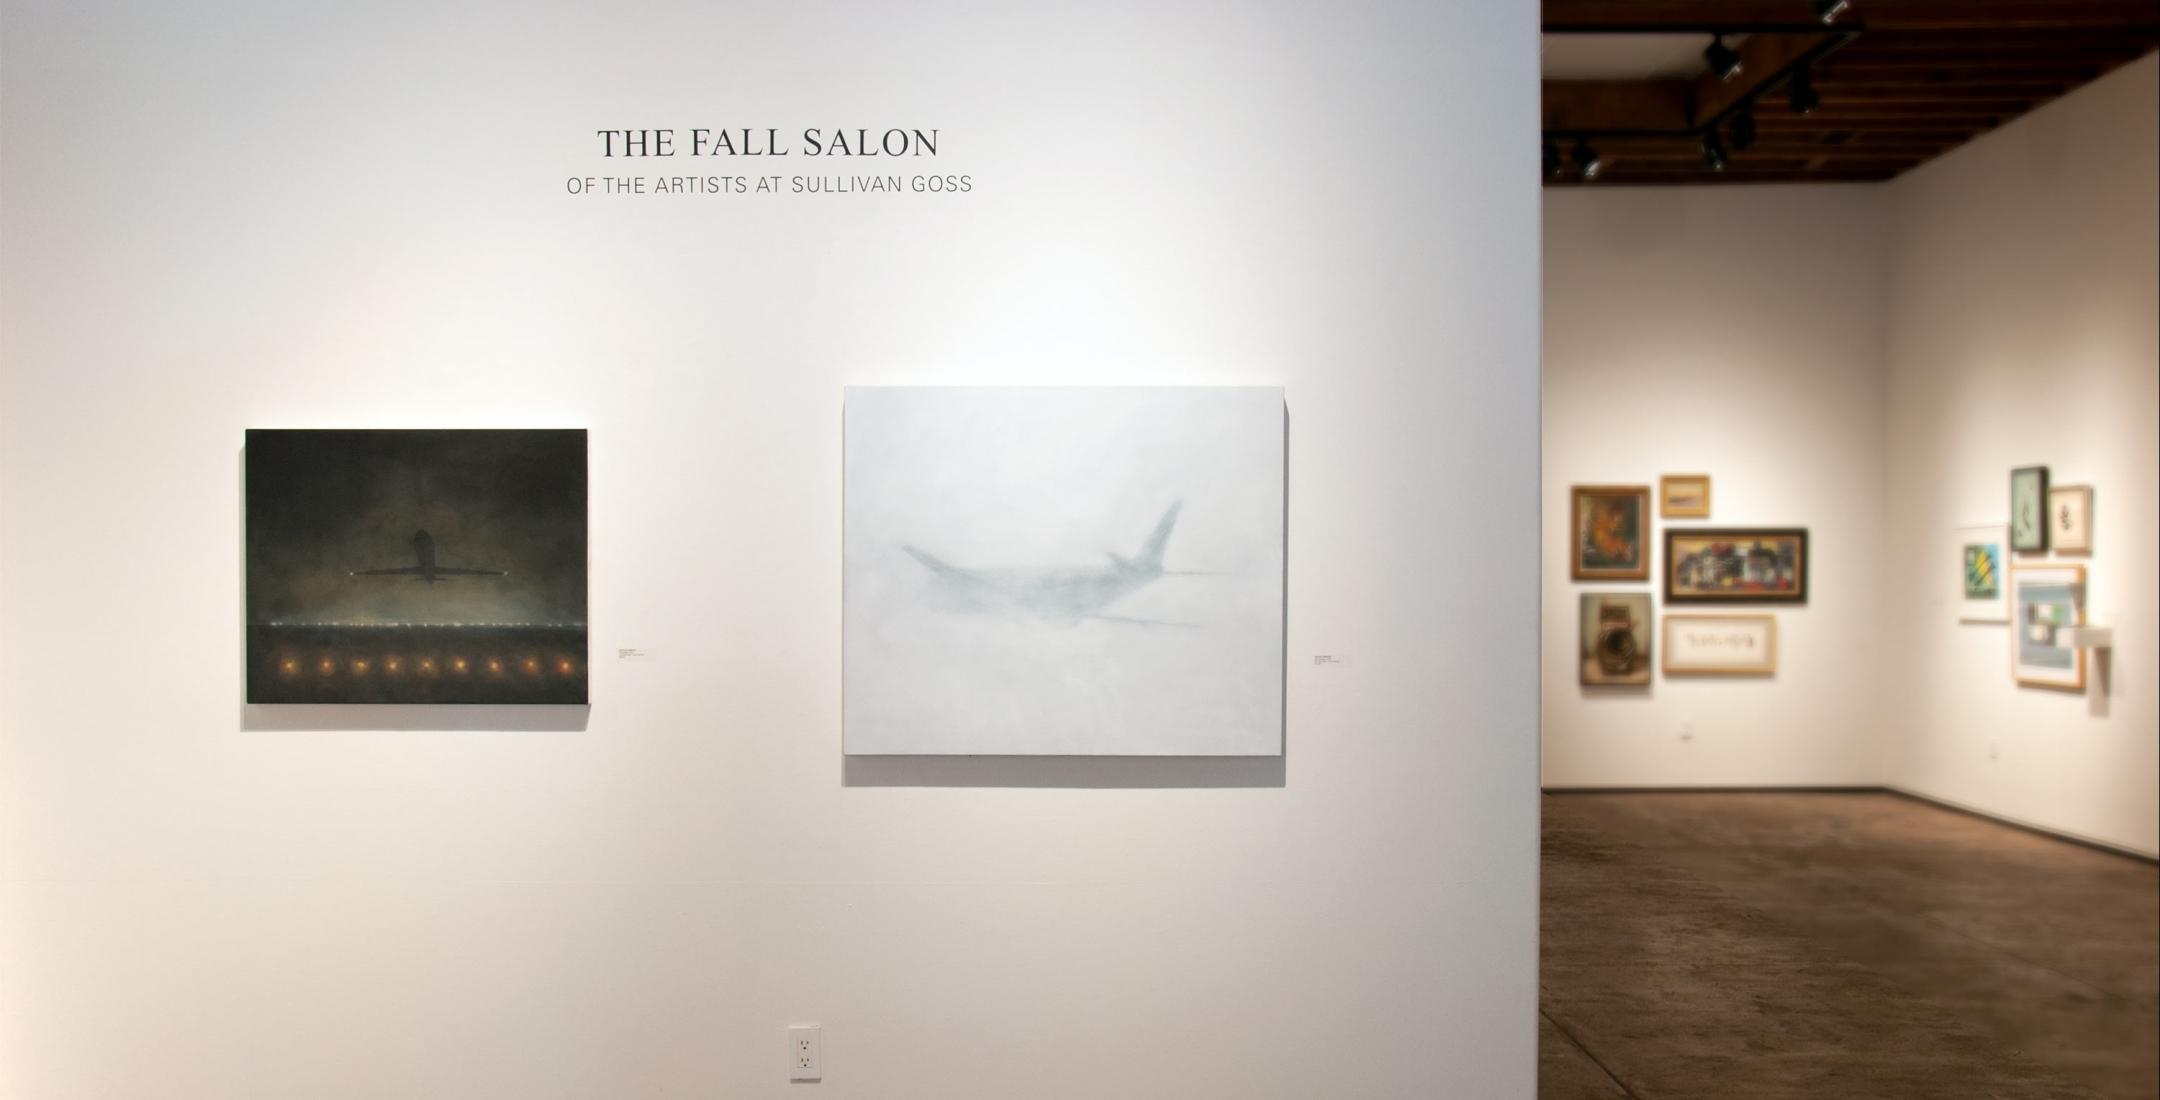 THE FALL SALON, 2019